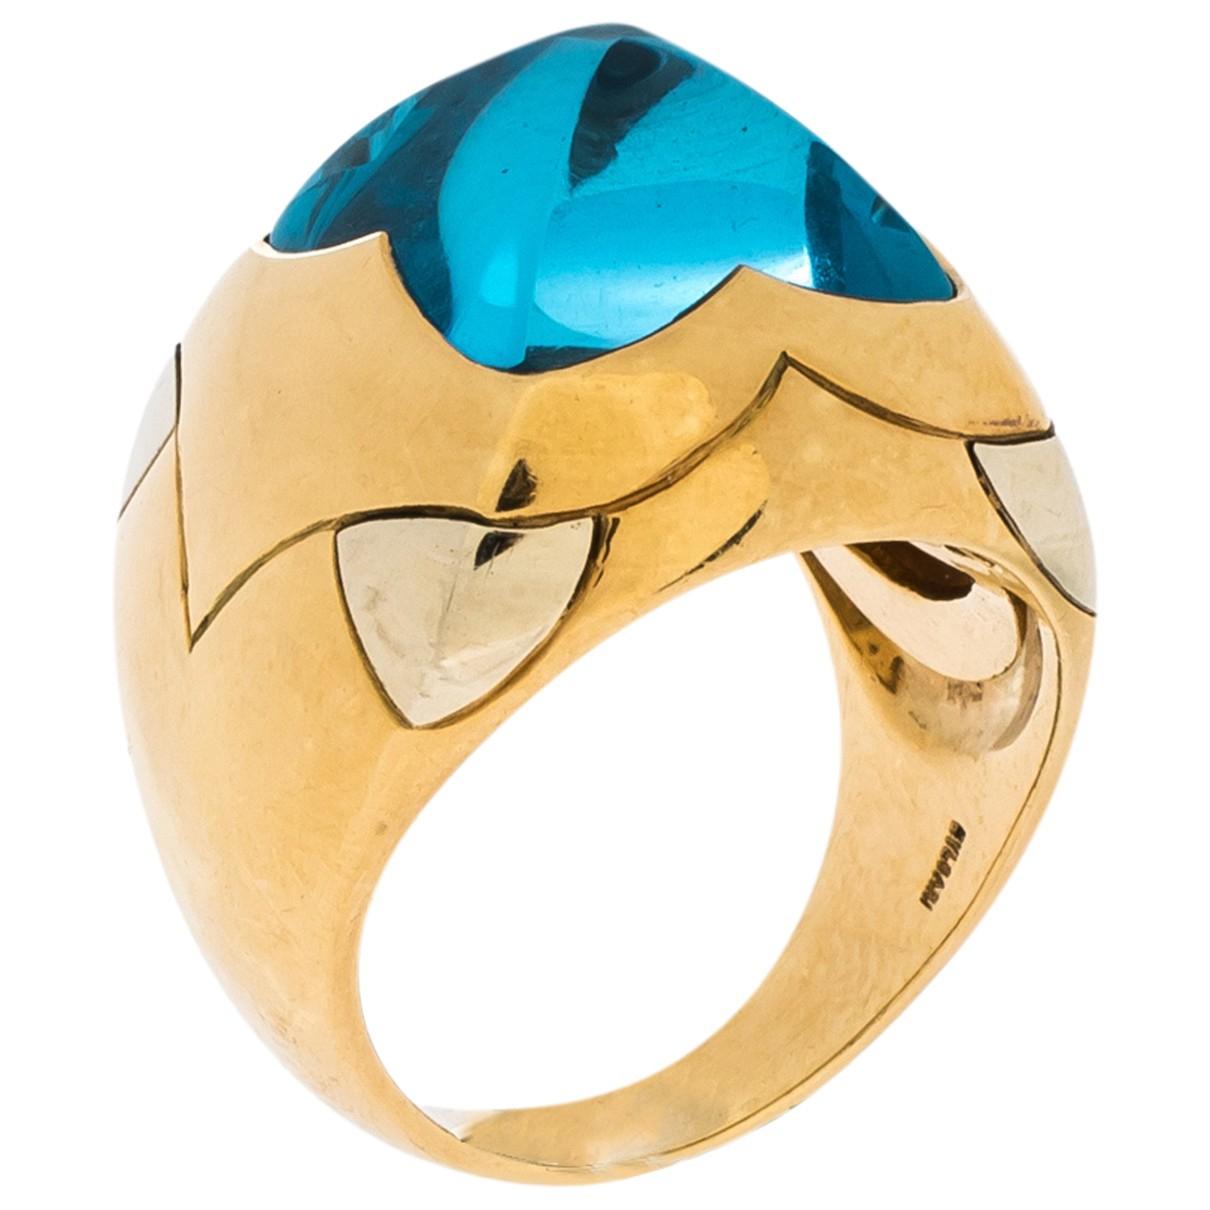 Bvlgari - Bague   pour femme en or jaune - bleu